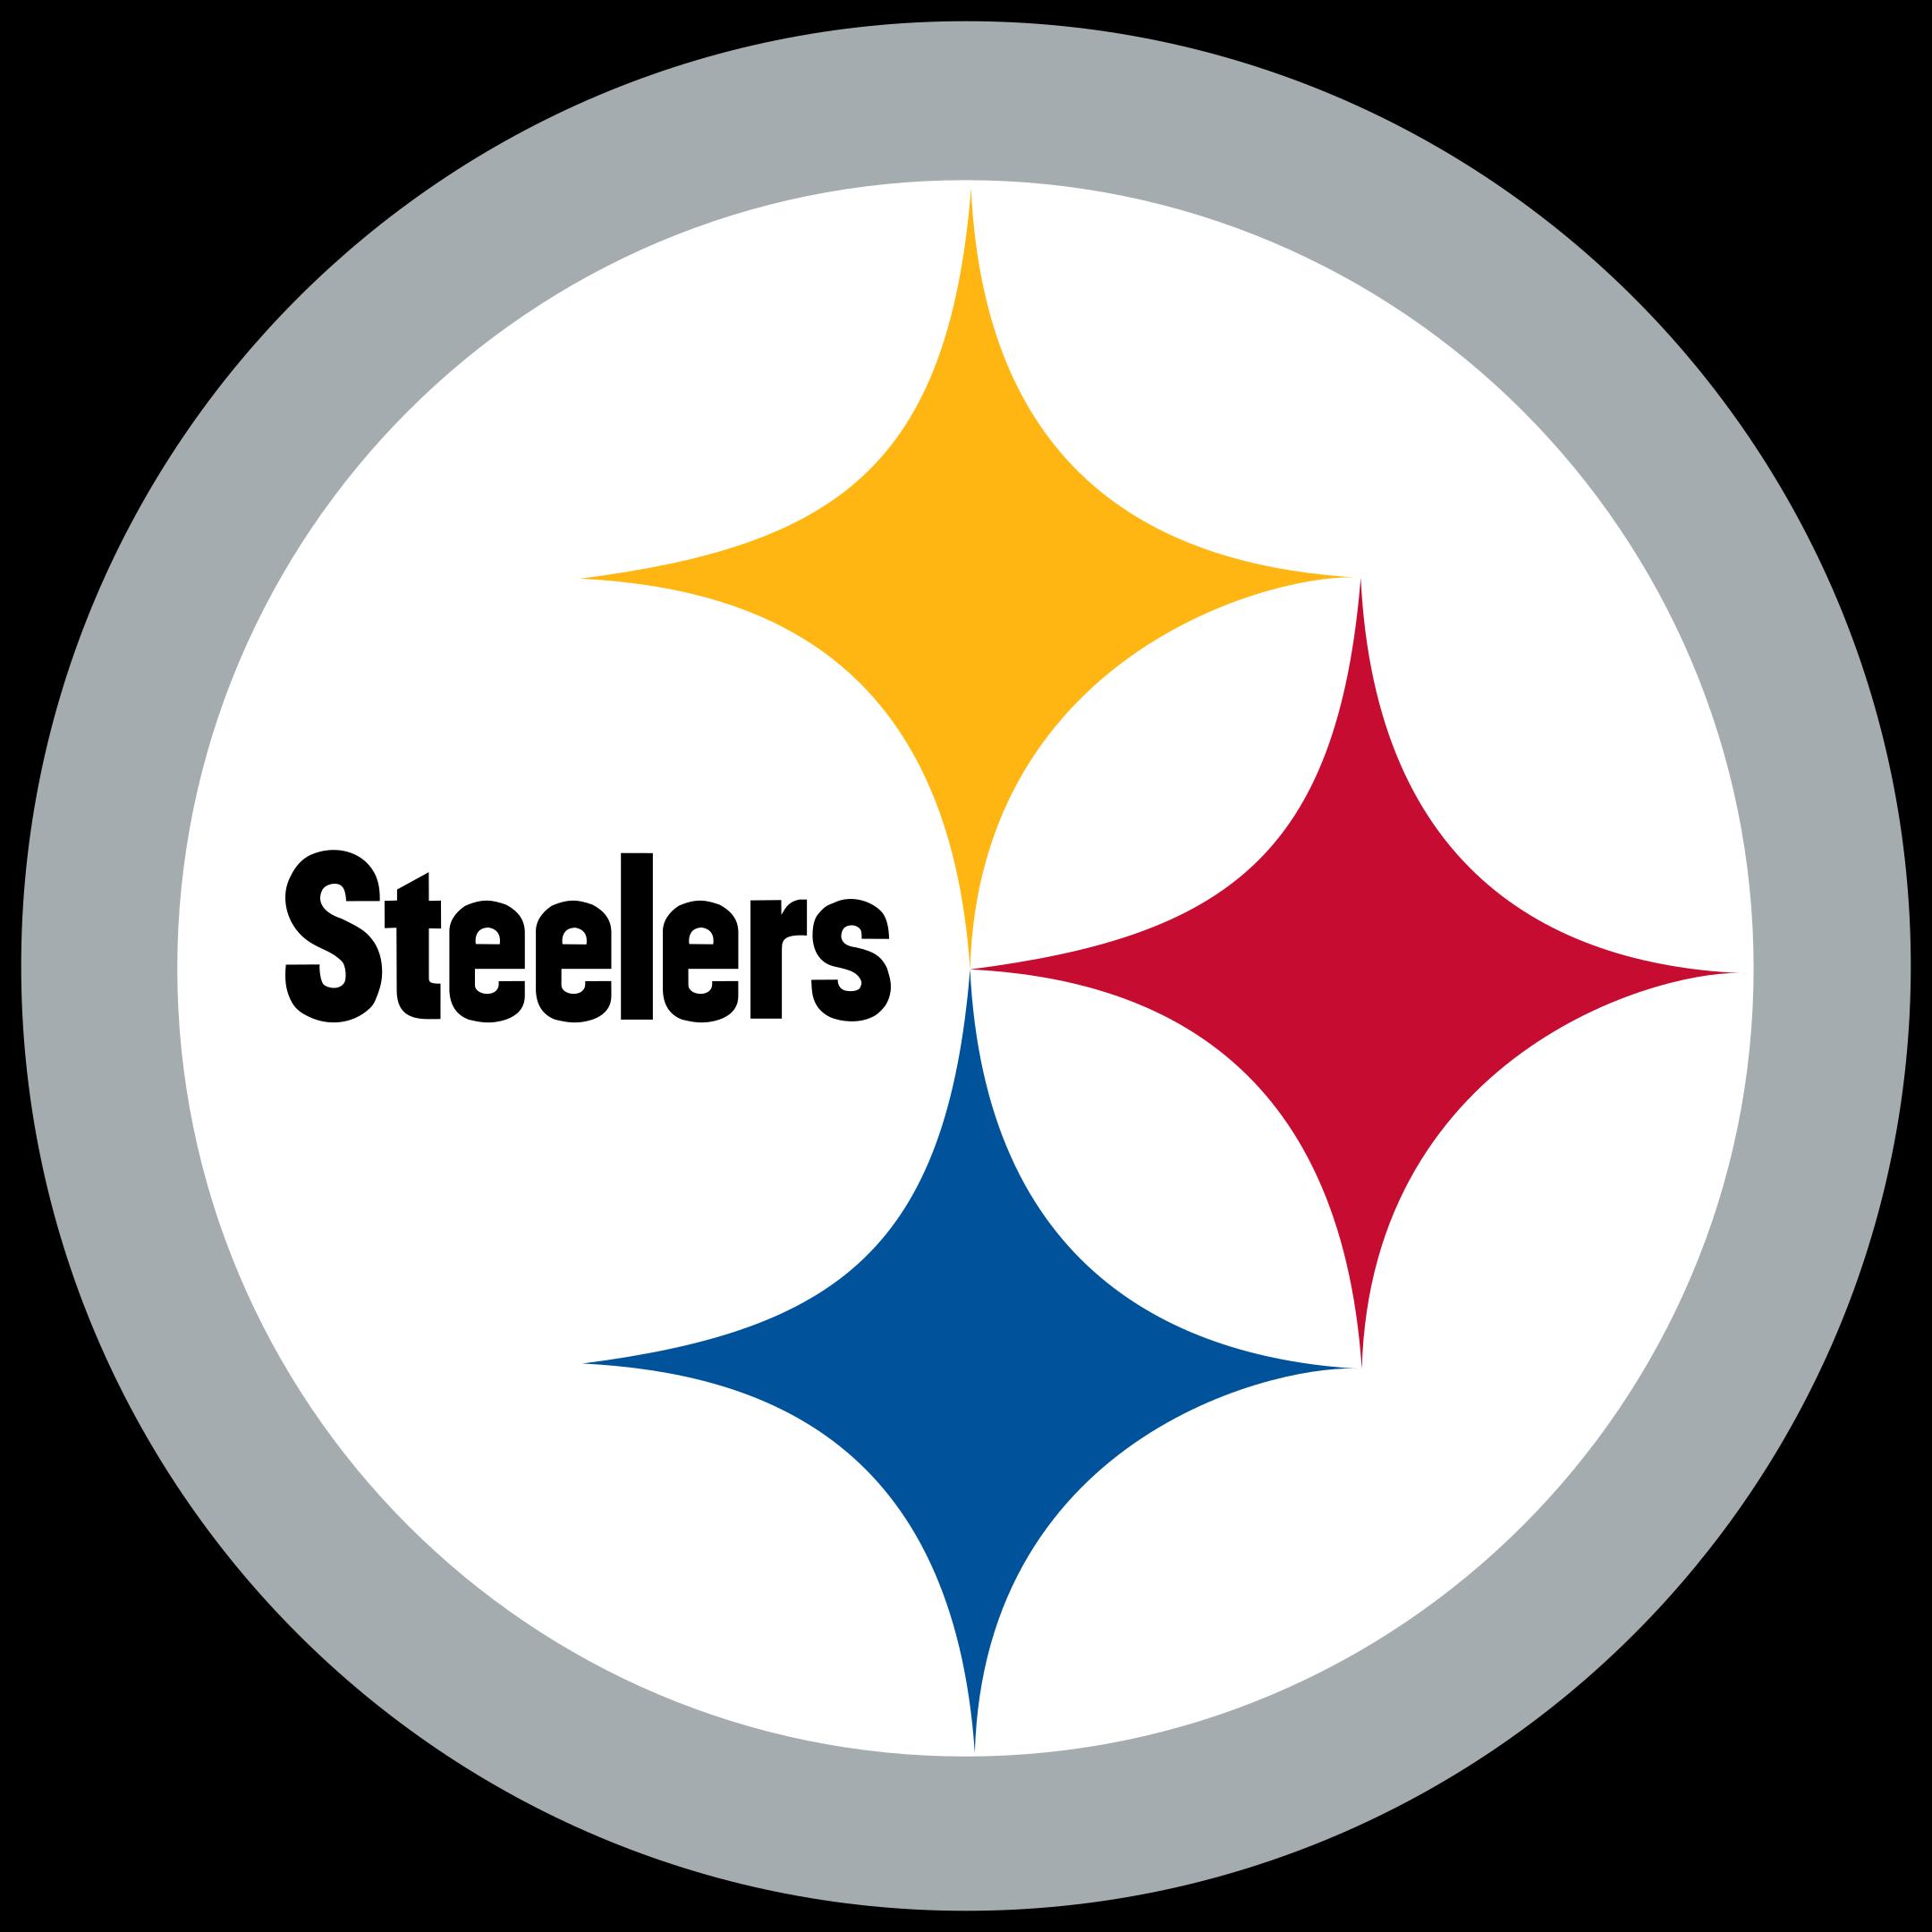 pittsburgh steelers logo 1 - Pittsburgh Steelers Logo